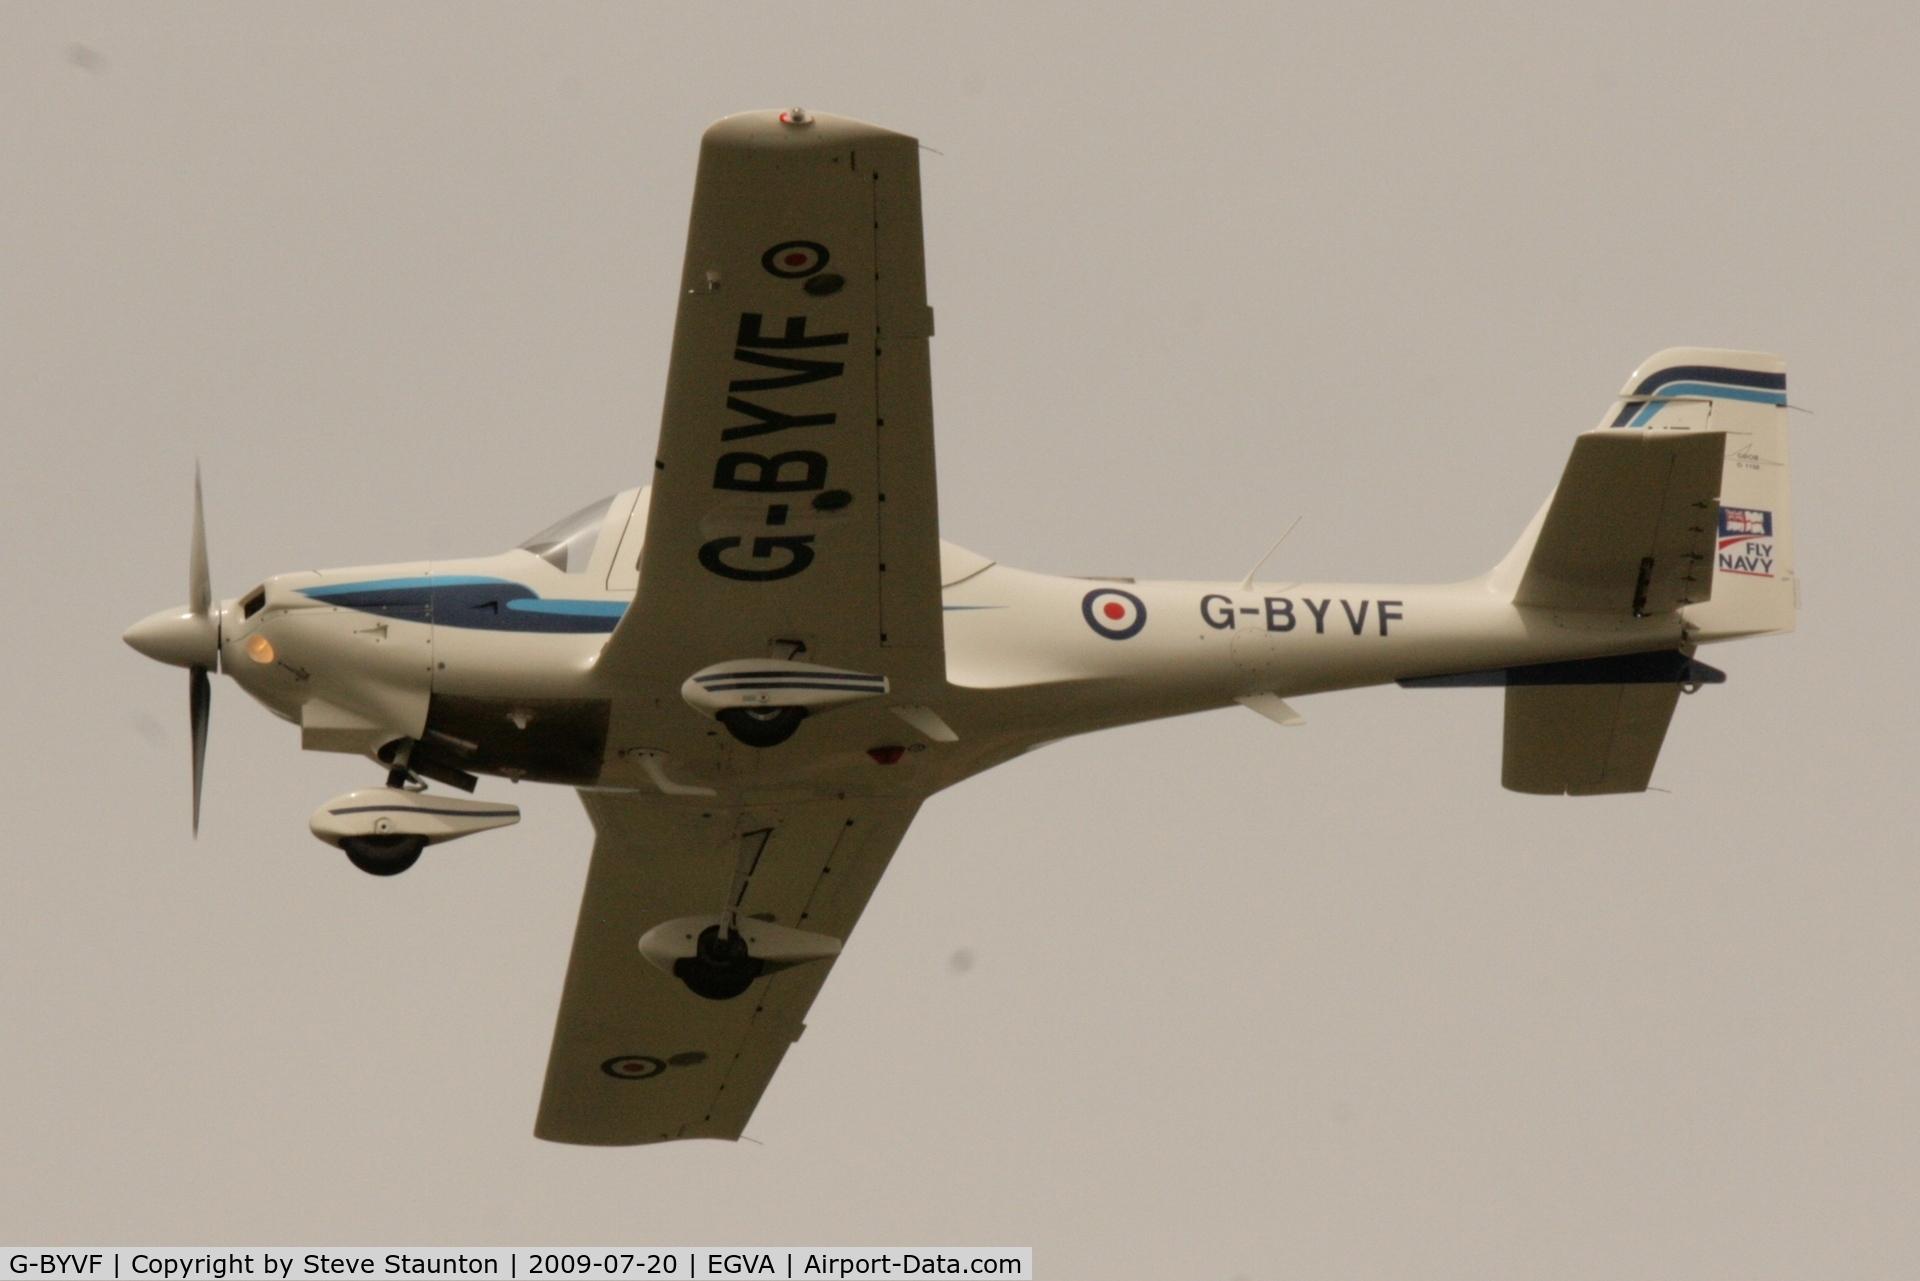 G-BYVF, 2000 Grob G-115E Tutor T1 C/N 82116/E, Taken at the Royal International Air Tattoo 2009